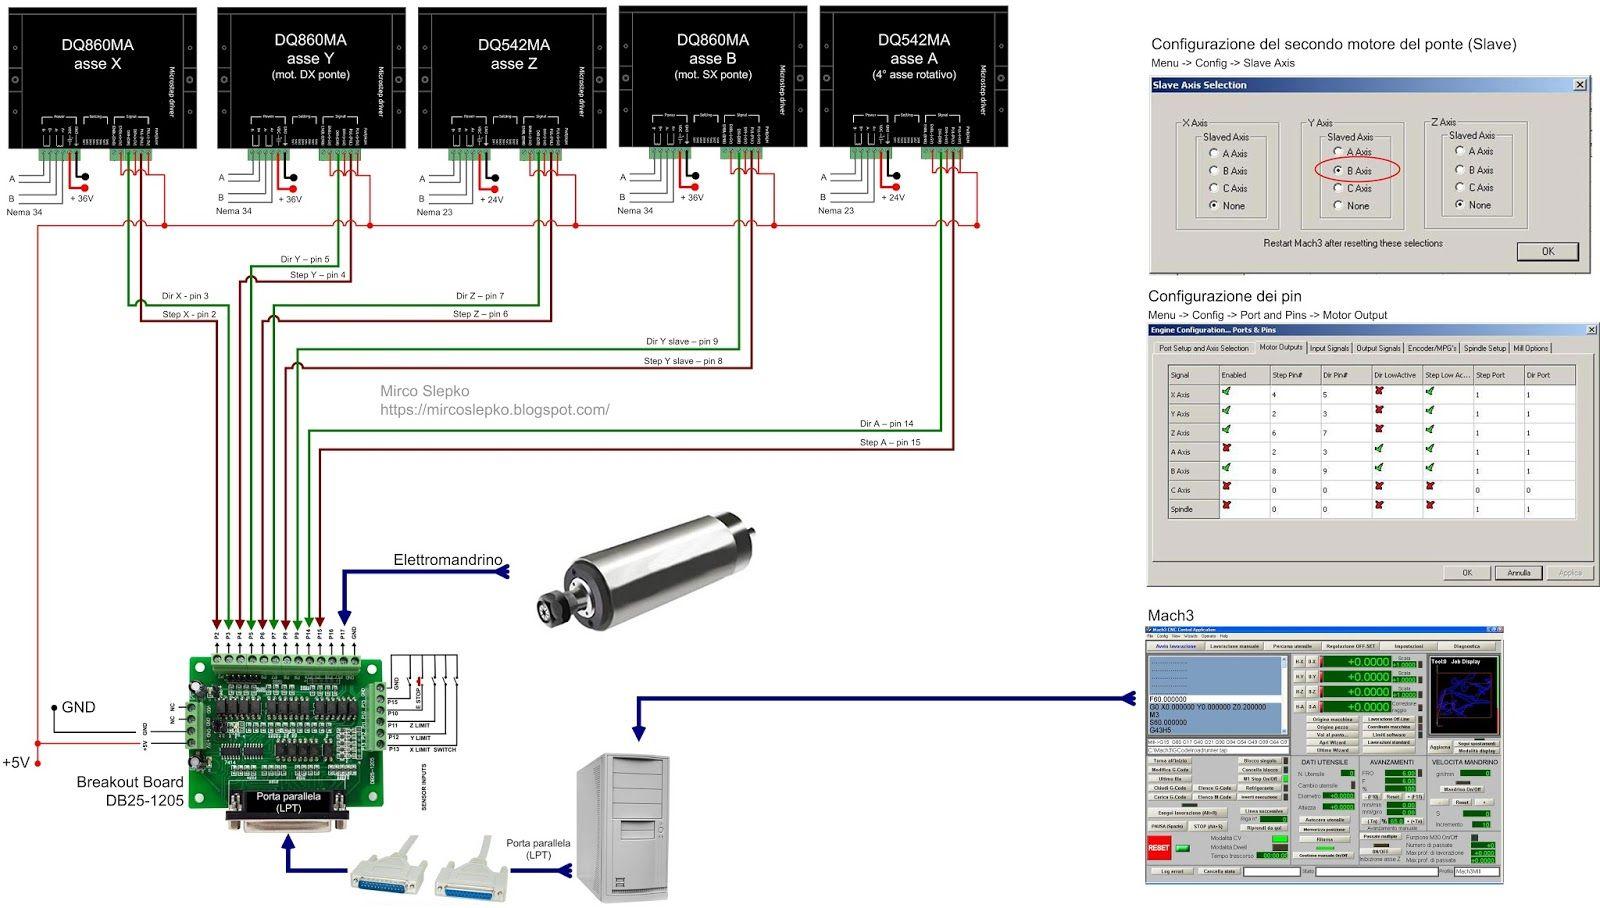 wiring DB25-1205, DQ860MA Driver, DQ542MA driver | Cnc | Pinterest ...